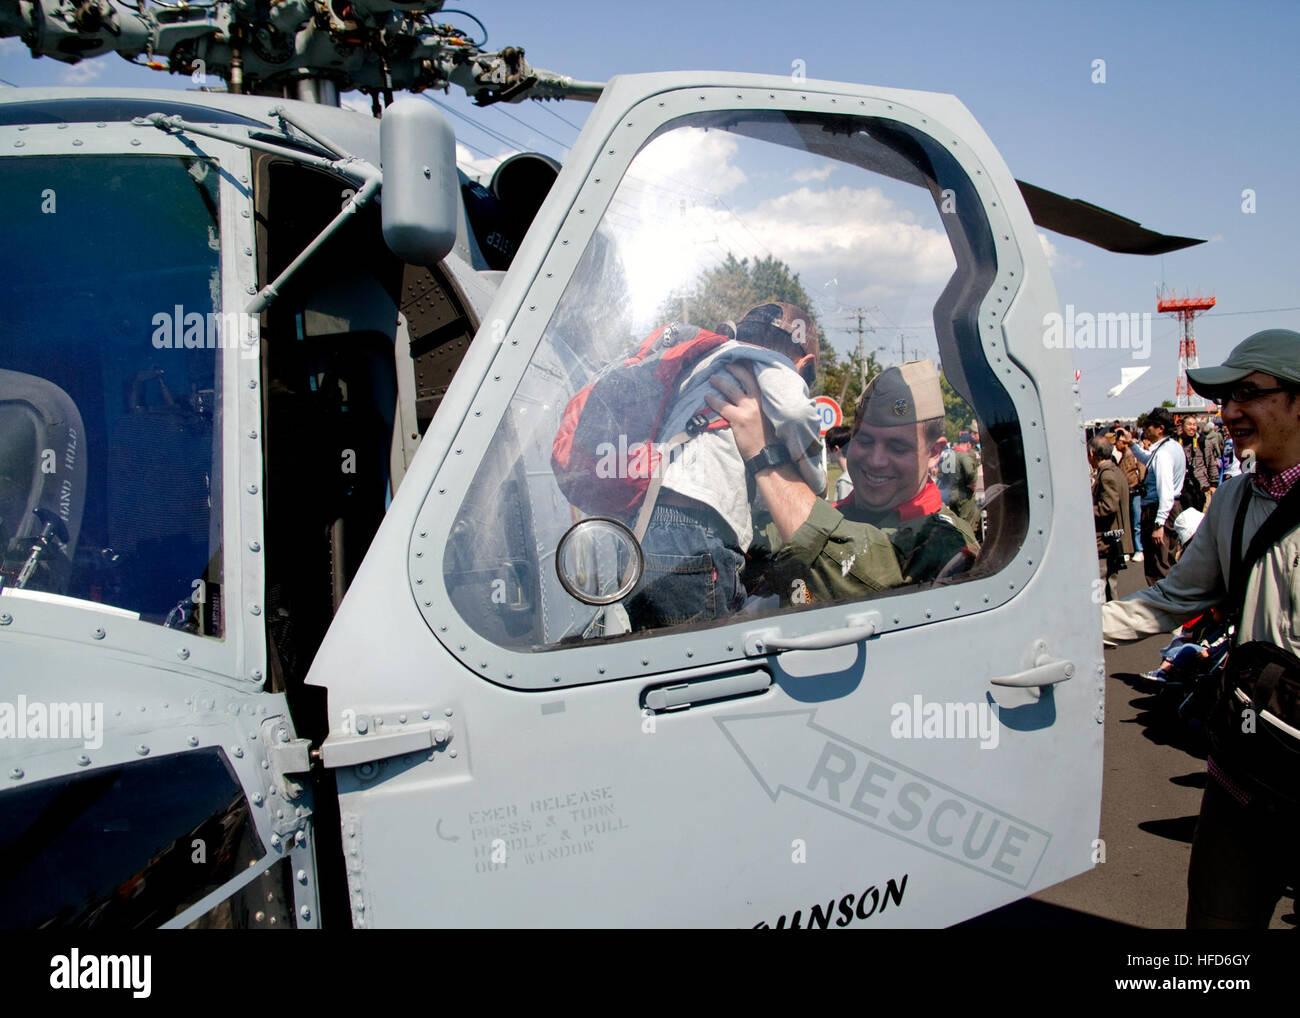 AYASE, Japan (April 27, 2013) Lt. James Walsh, of Helicopter Maritime Strike Squadron (HSM) 51, helps a japanese - Stock Image